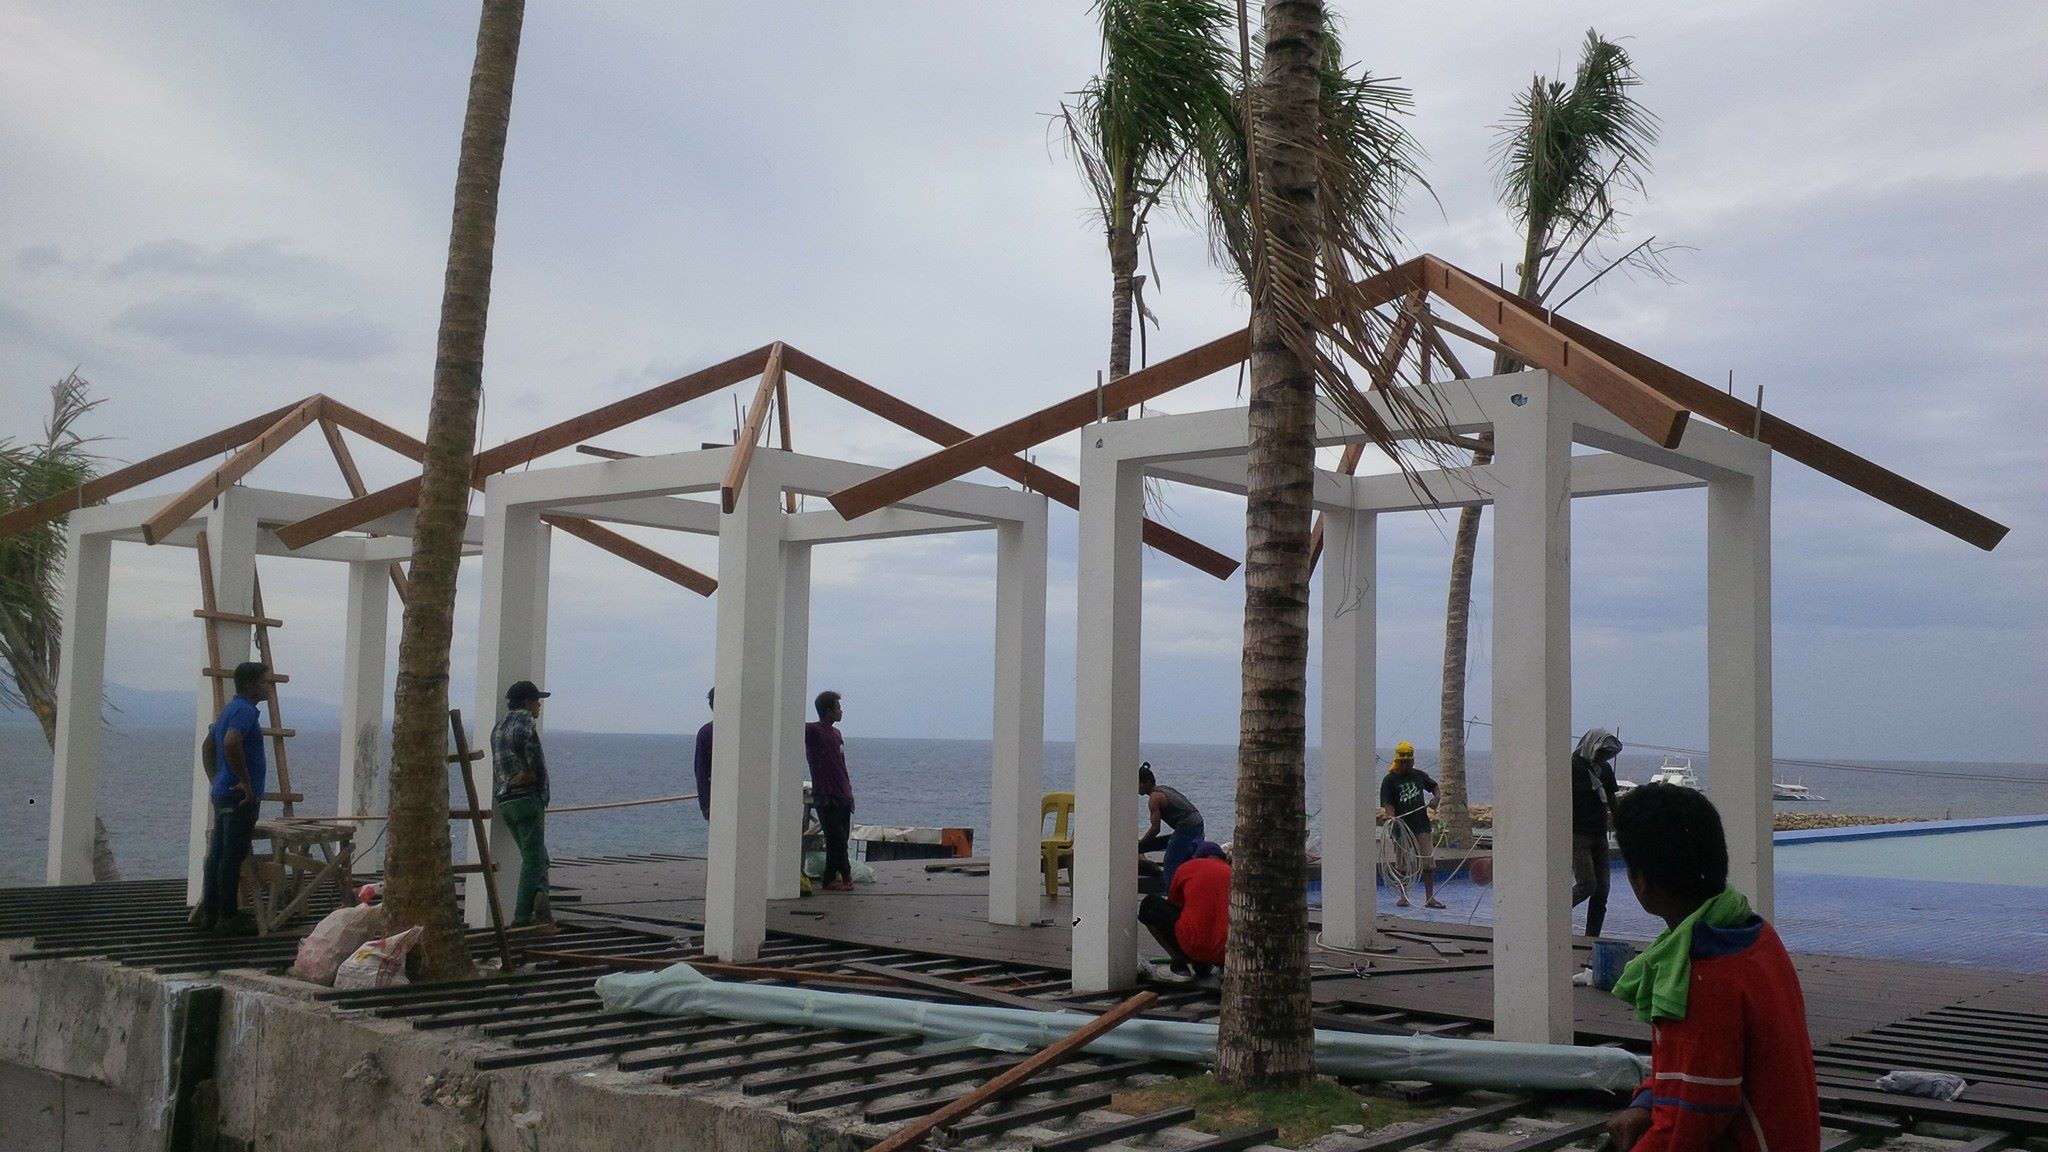 Robinson's Amisa Private Residences. Punta Engano Mactan, Cebu - 4